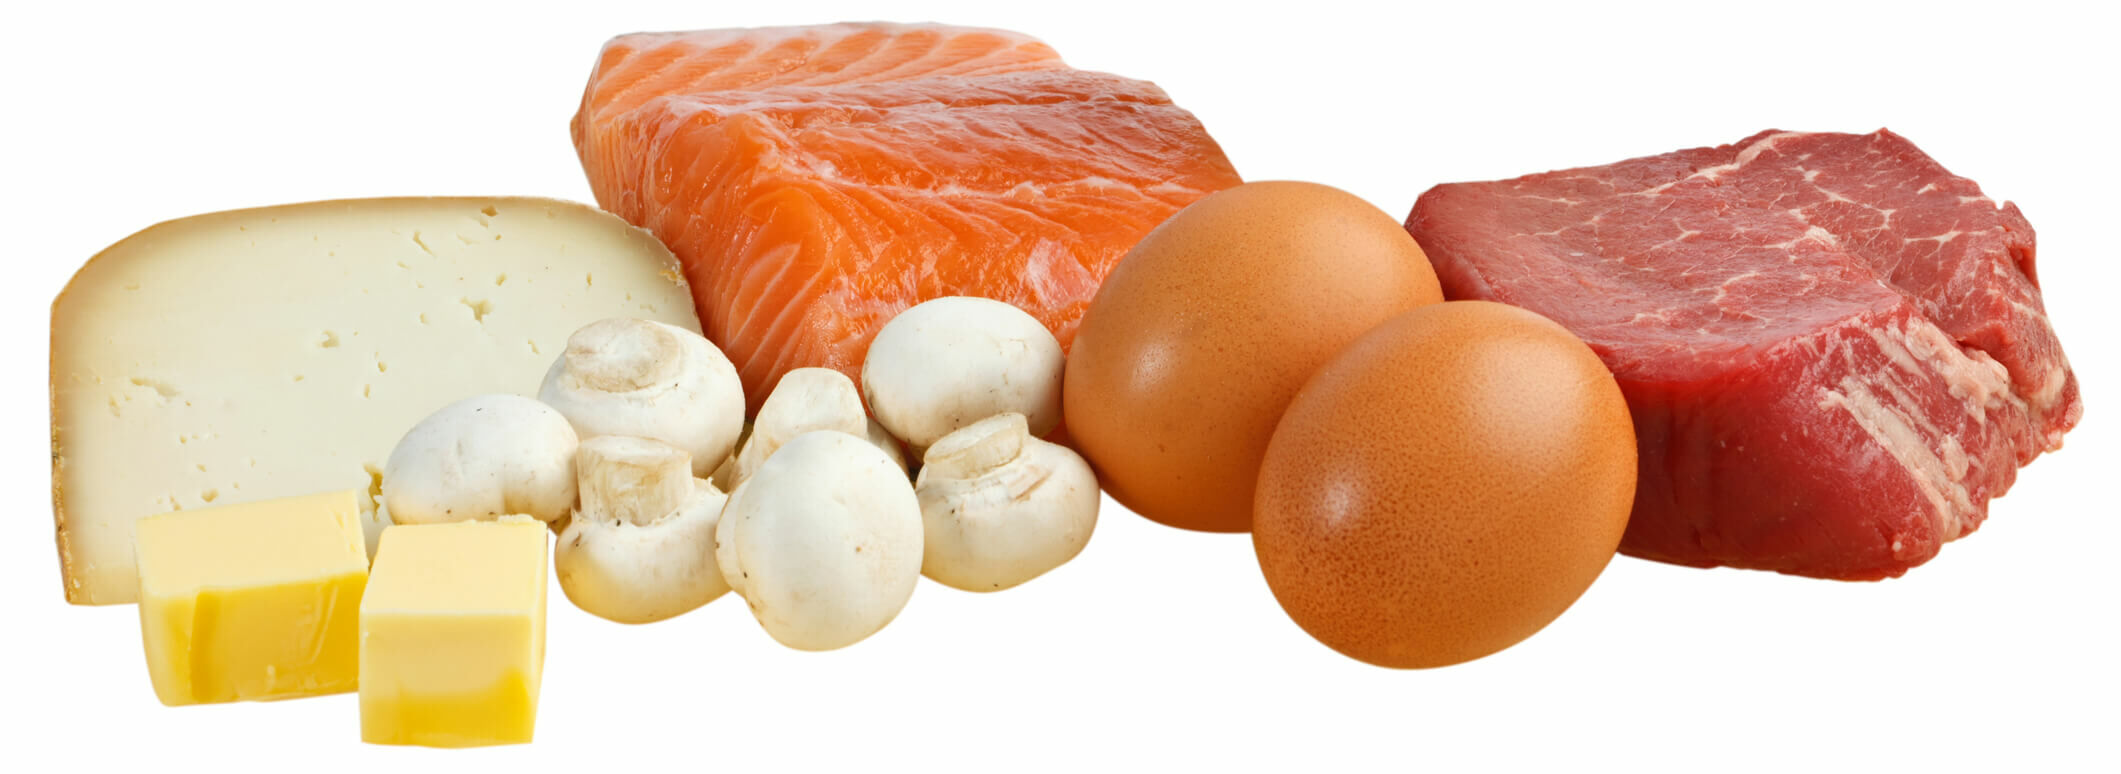 d vitaminban gazdag táplálékok